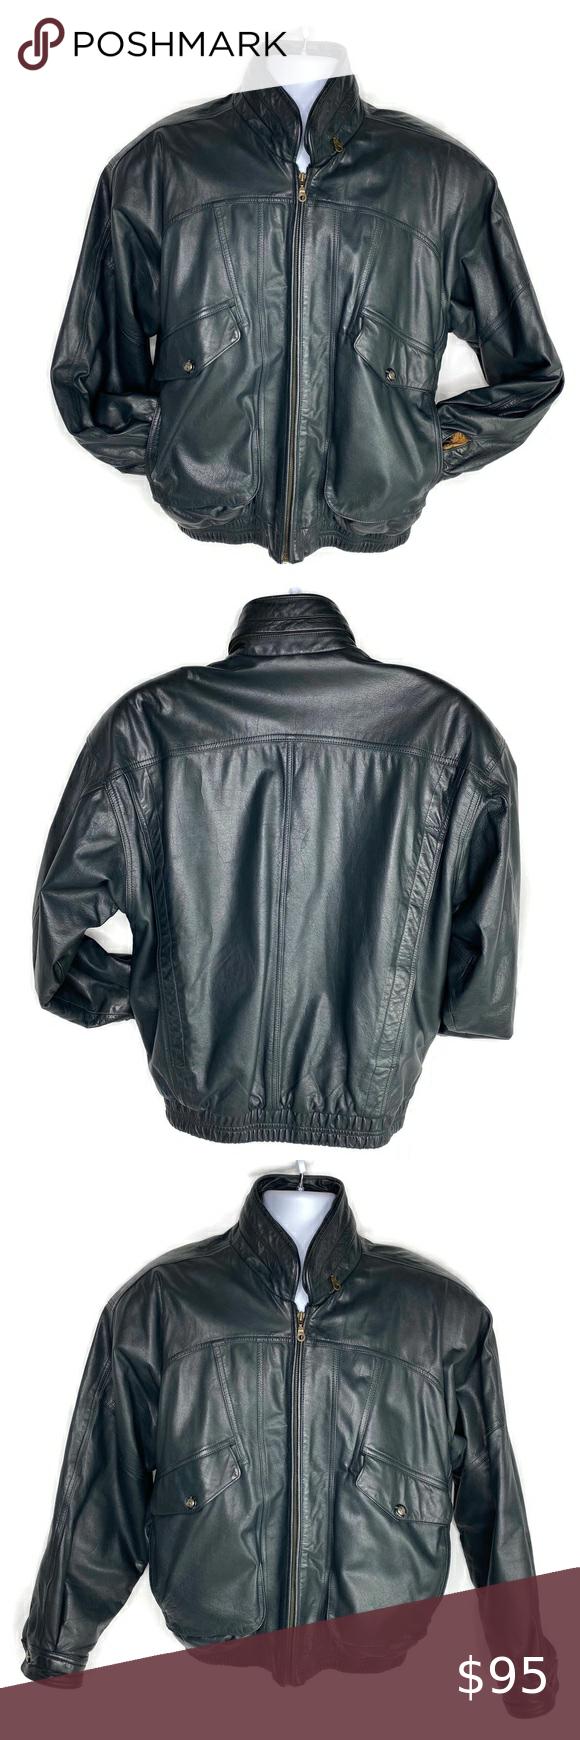 True Breed Heavy Leather Bomber Jacket Medium Leather Bomber Jacket Leather Bomber Bomber Jacket [ 1740 x 580 Pixel ]